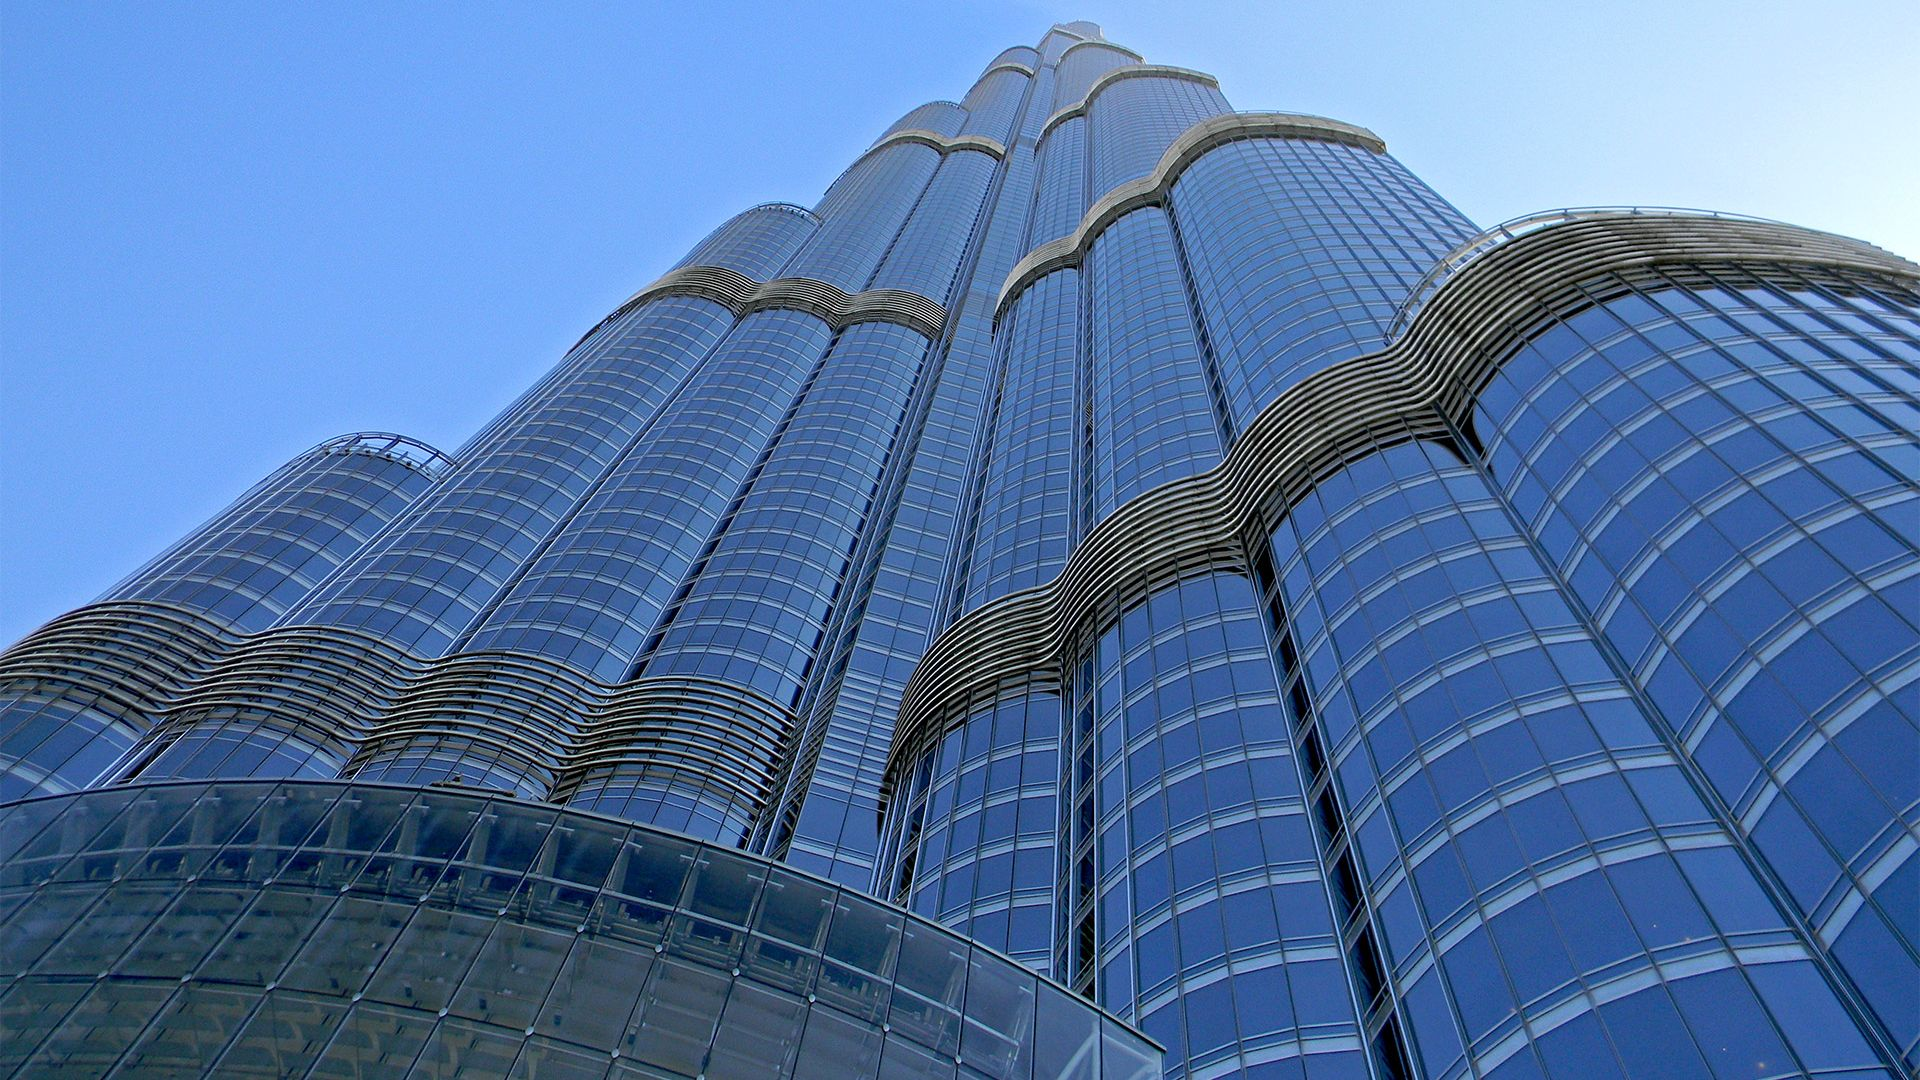 Craciun 2021 - Sejur charter Ras Al Khaima & Dubai, EAU, 8 zile